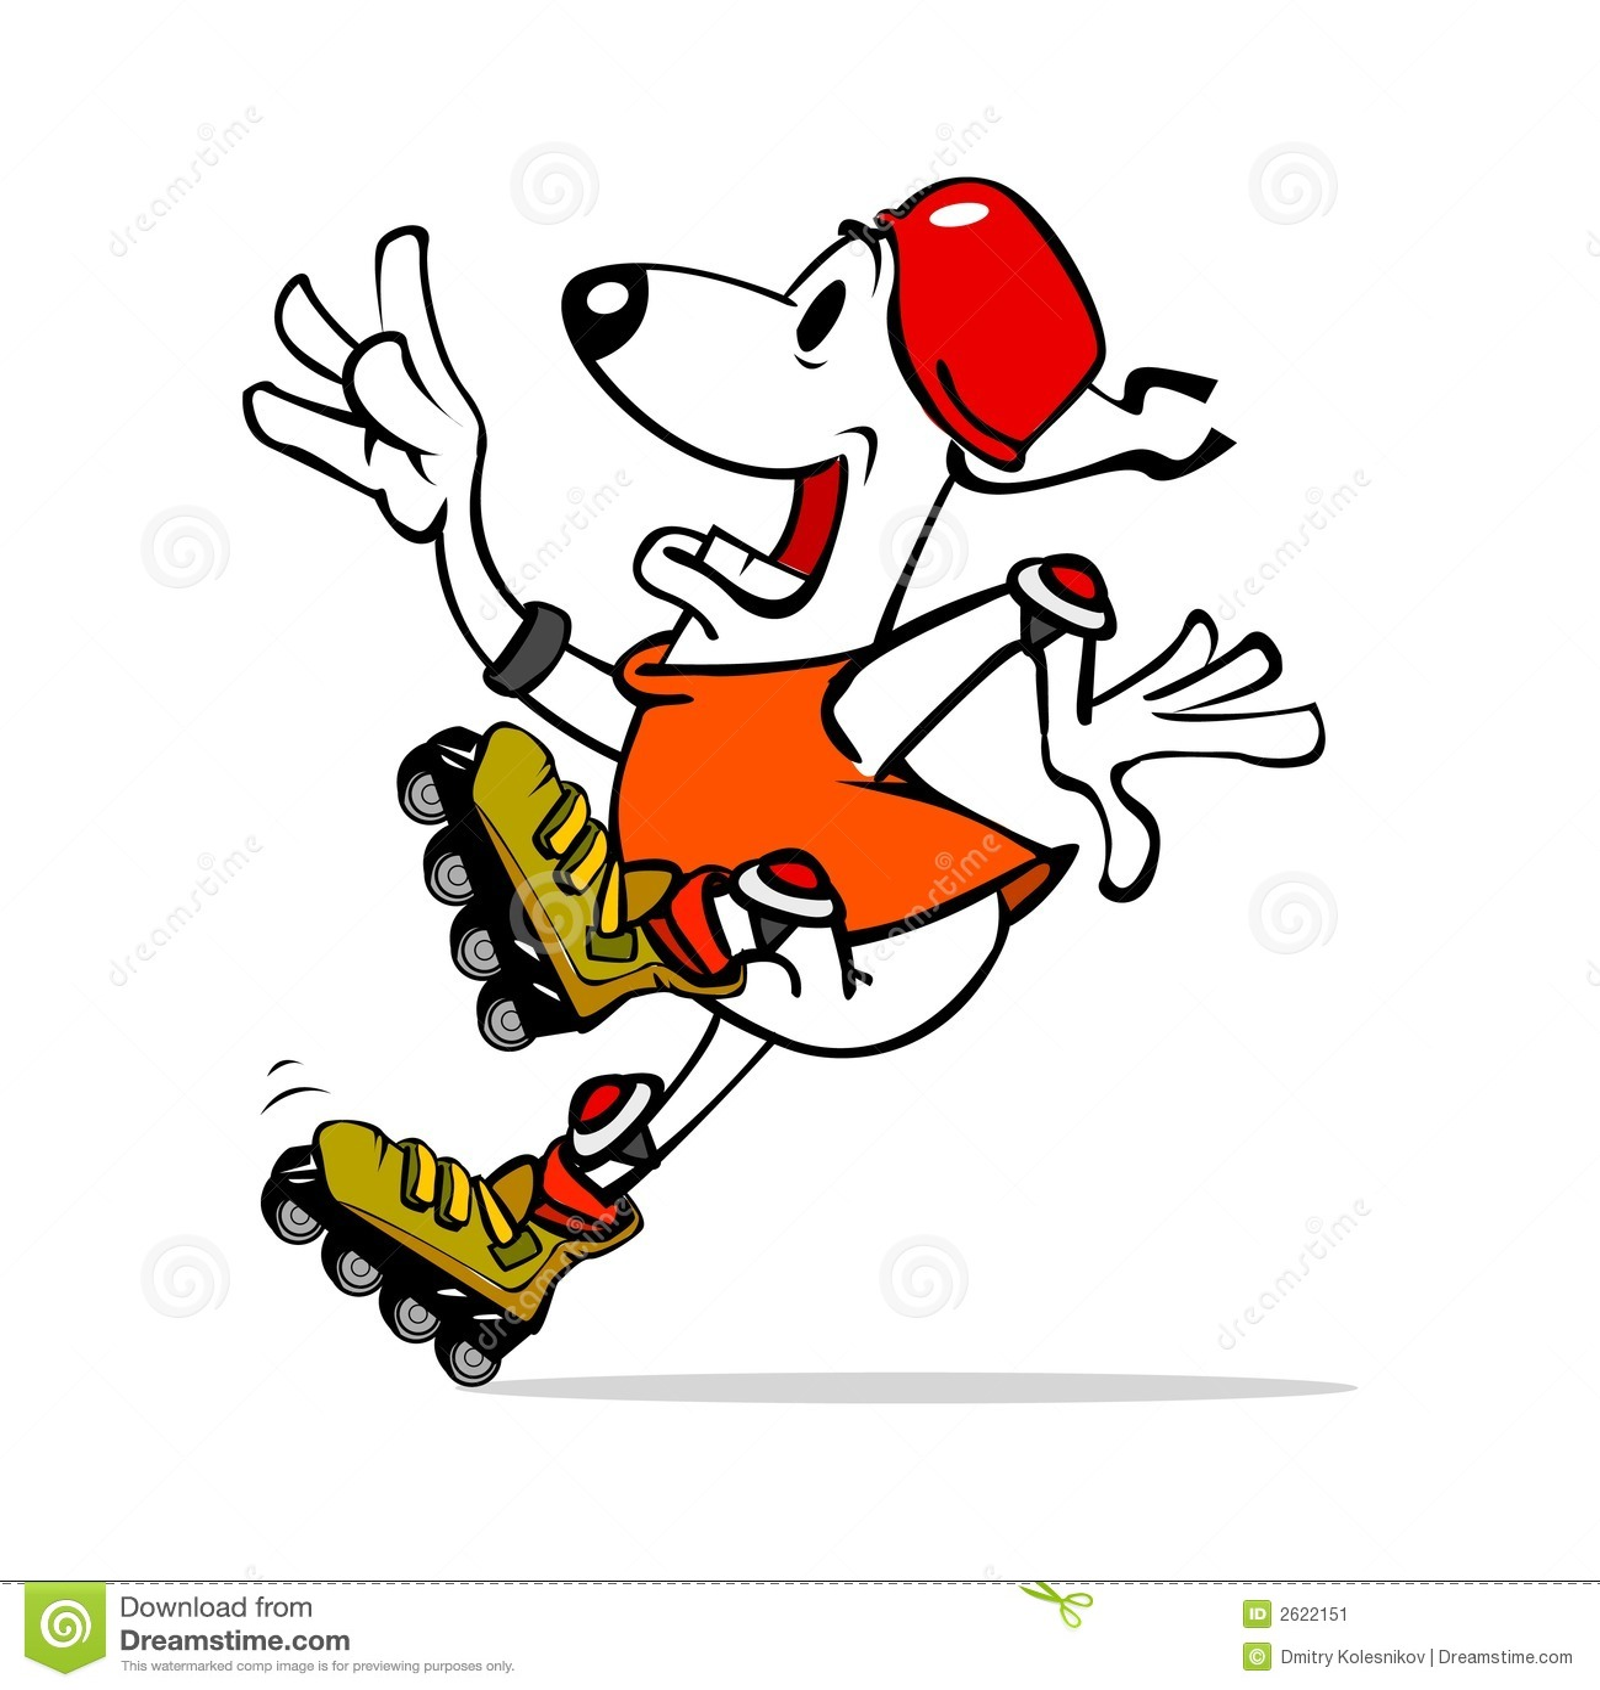 Roller skates for dogs - Dog On Roller Skates